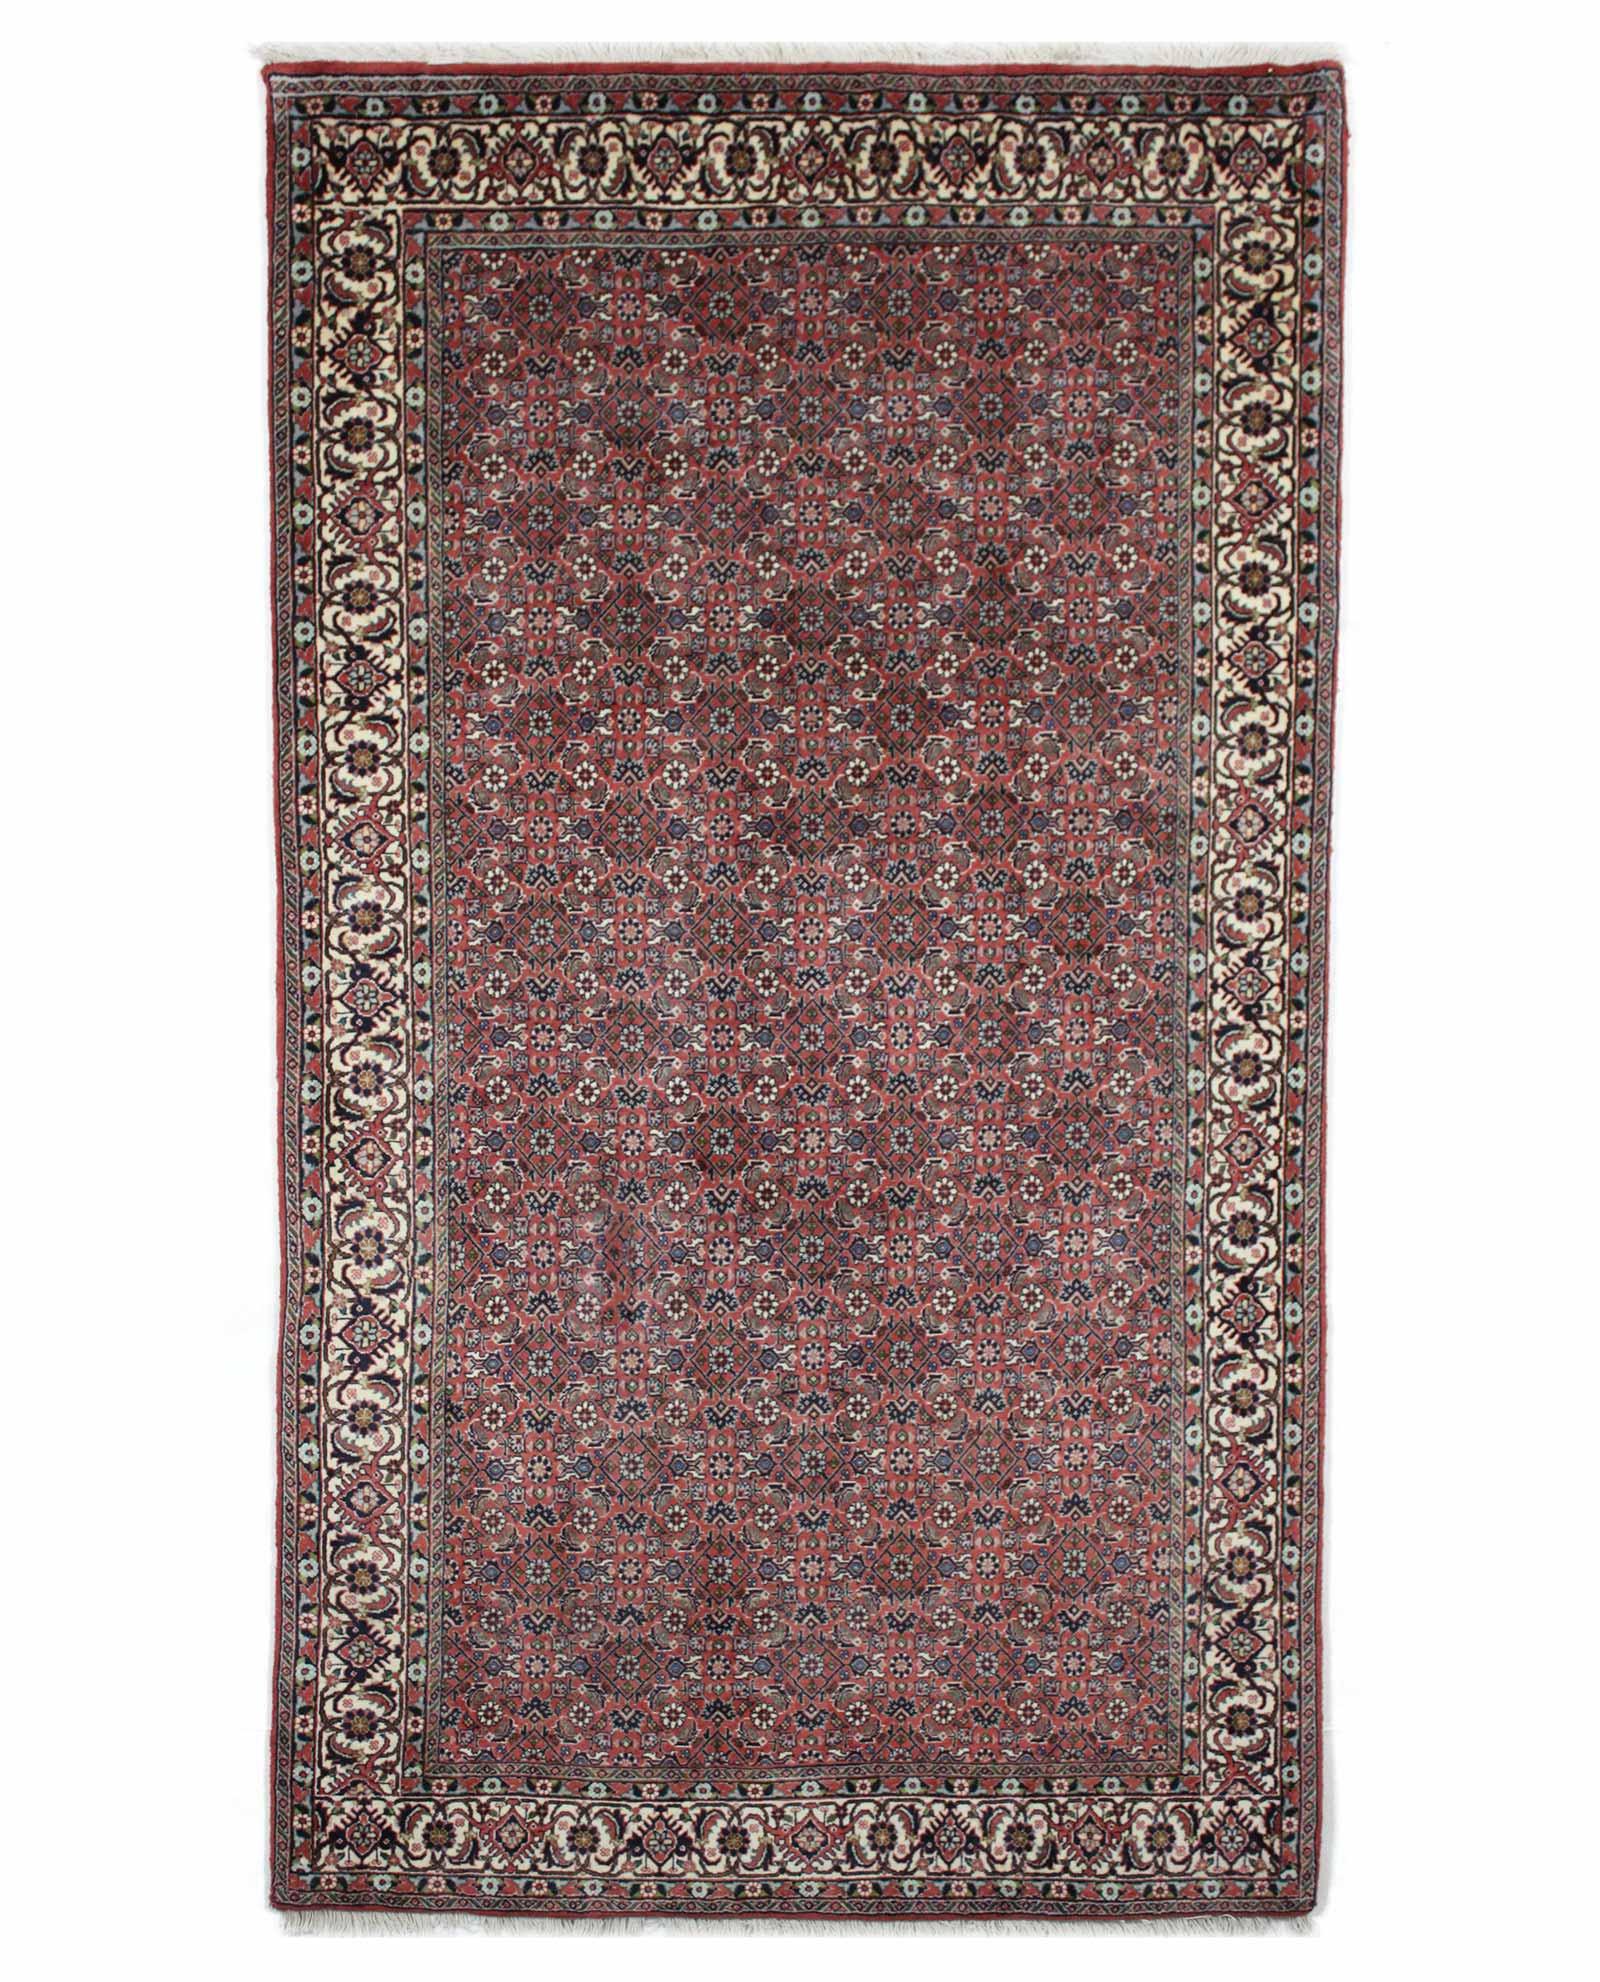 tapis persan bijar s3329 iranian carpet. Black Bedroom Furniture Sets. Home Design Ideas